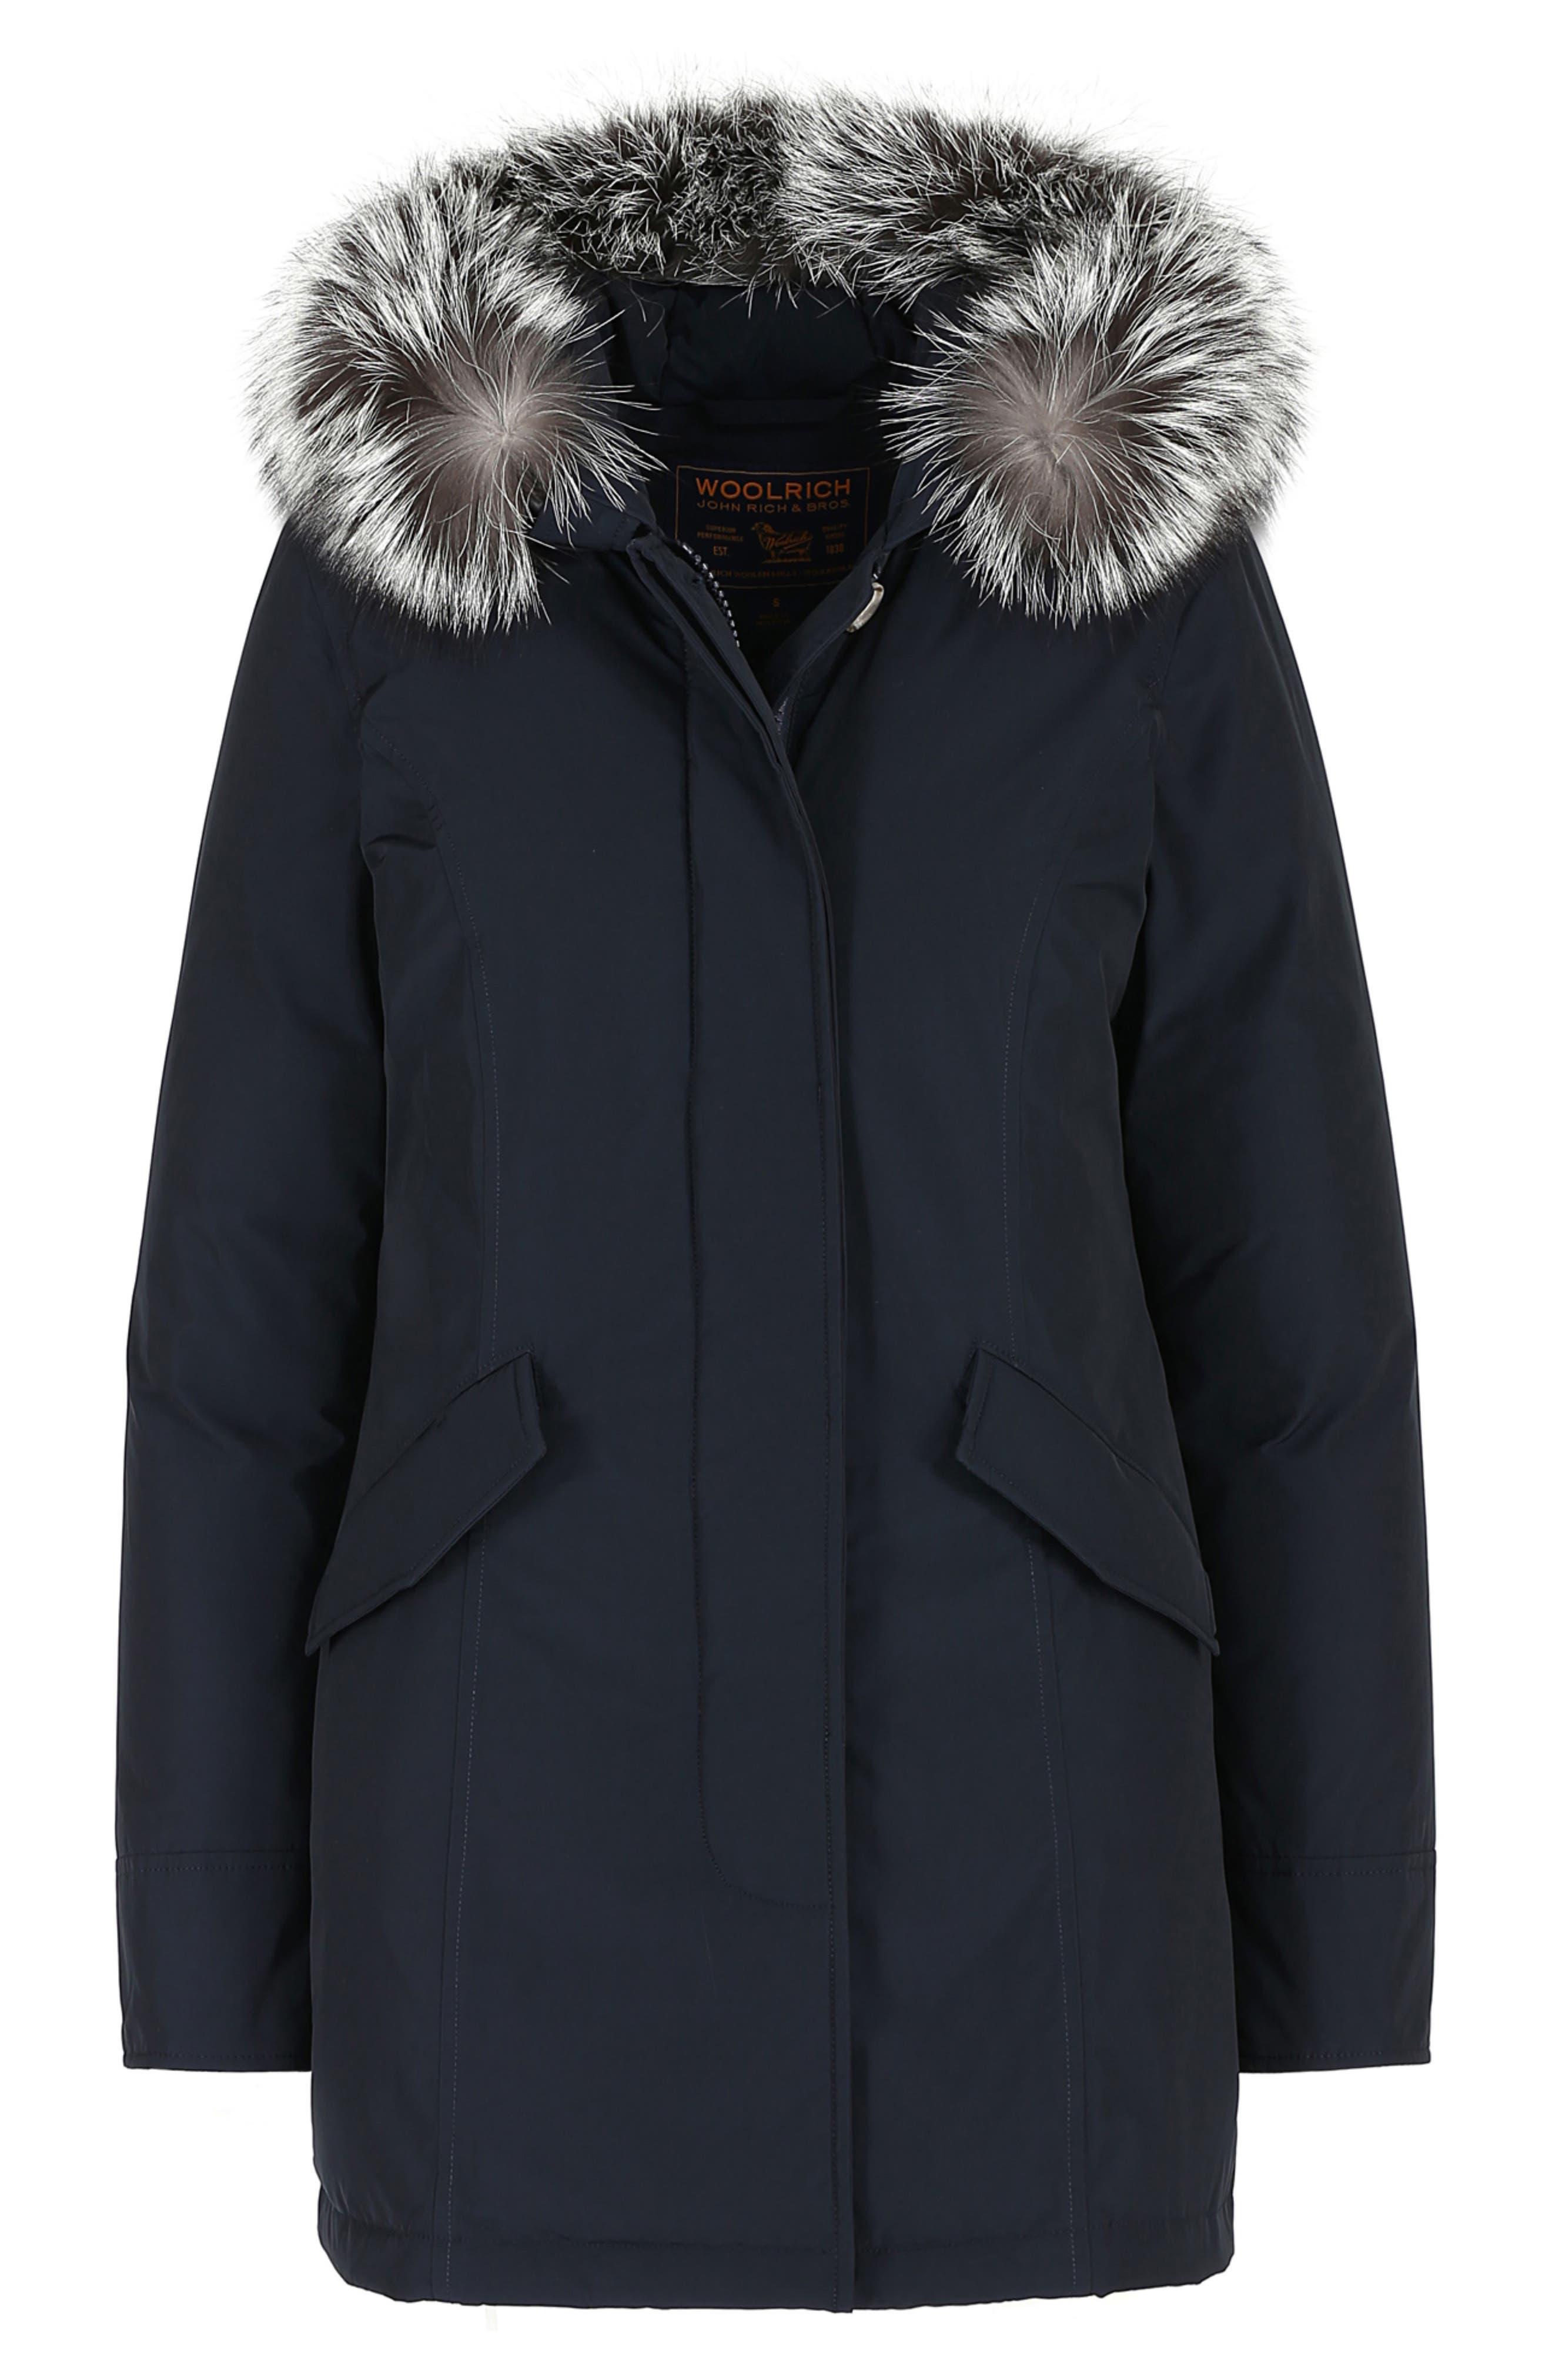 Luxury Arctic Down Parka with Genuine Fox Fur Trim,                             Alternate thumbnail 10, color,                             MIDNIGHT BLUE